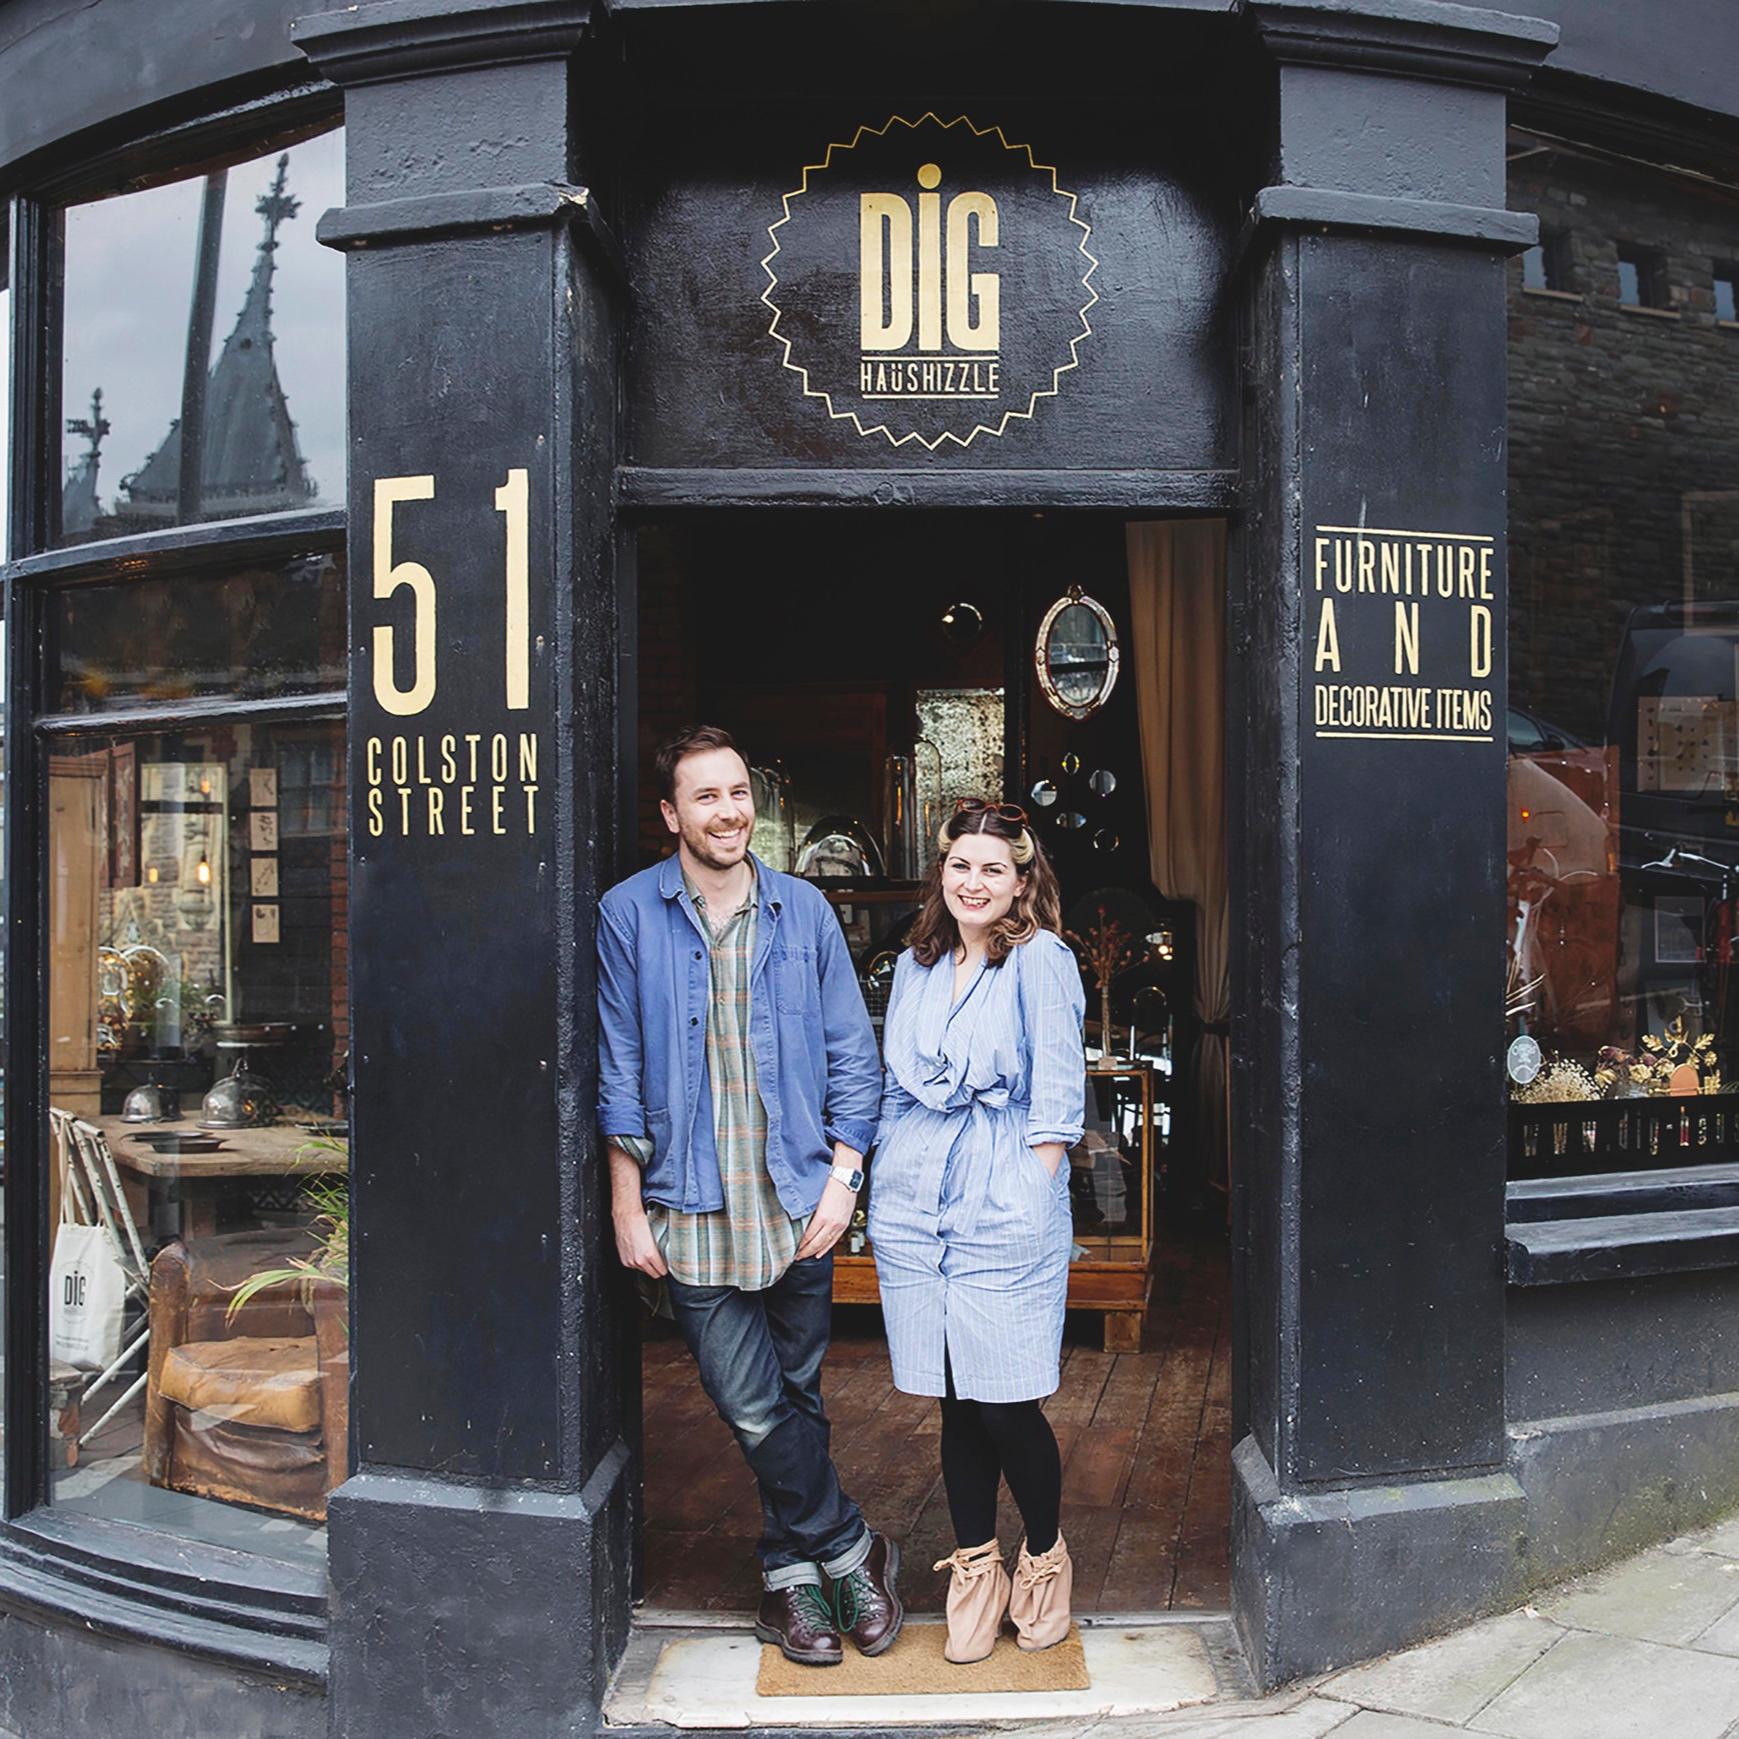 Edward and Cassie Nicholas Dig Haushizzle Bristol. Decorative Antique and Vintage furniture shop. Interior Design Masters BBC, Netflix, Fearne Cotton